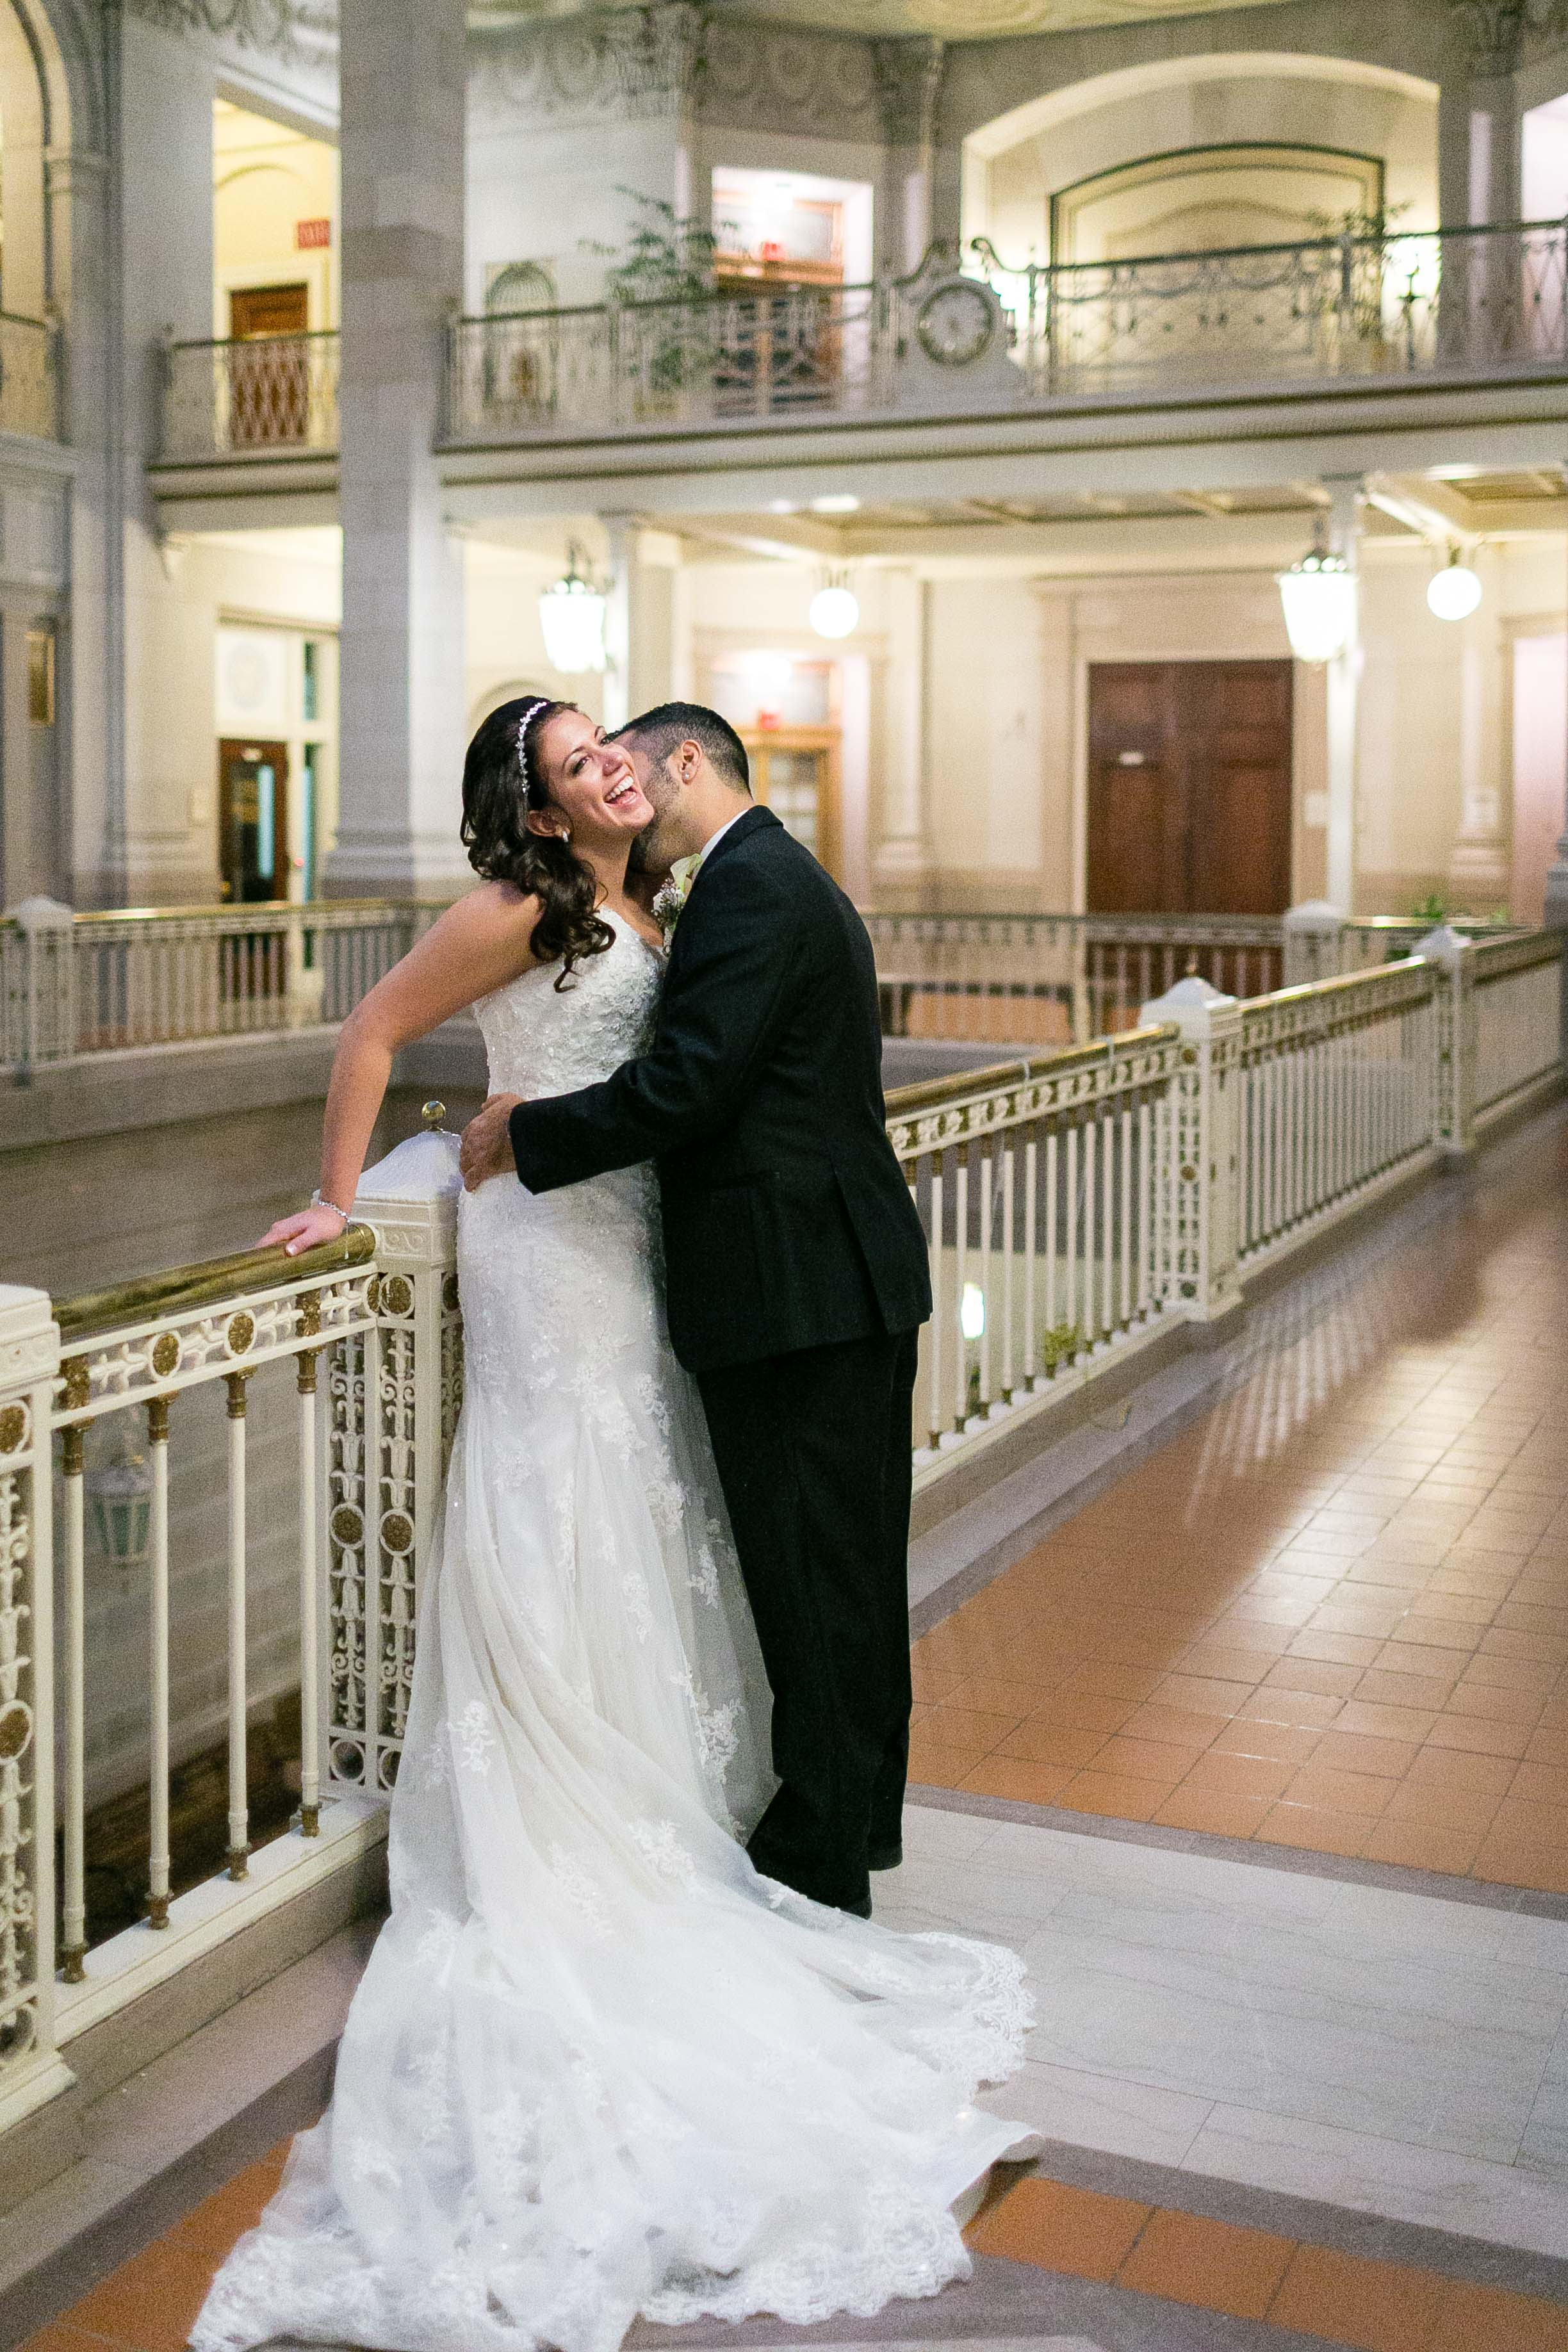 Greek-Wedding-Hartford-La-Notte-Restaurant-Connecticut-Documentary-Wedding-Photography-by-Jacek-Dolata-16.jpg